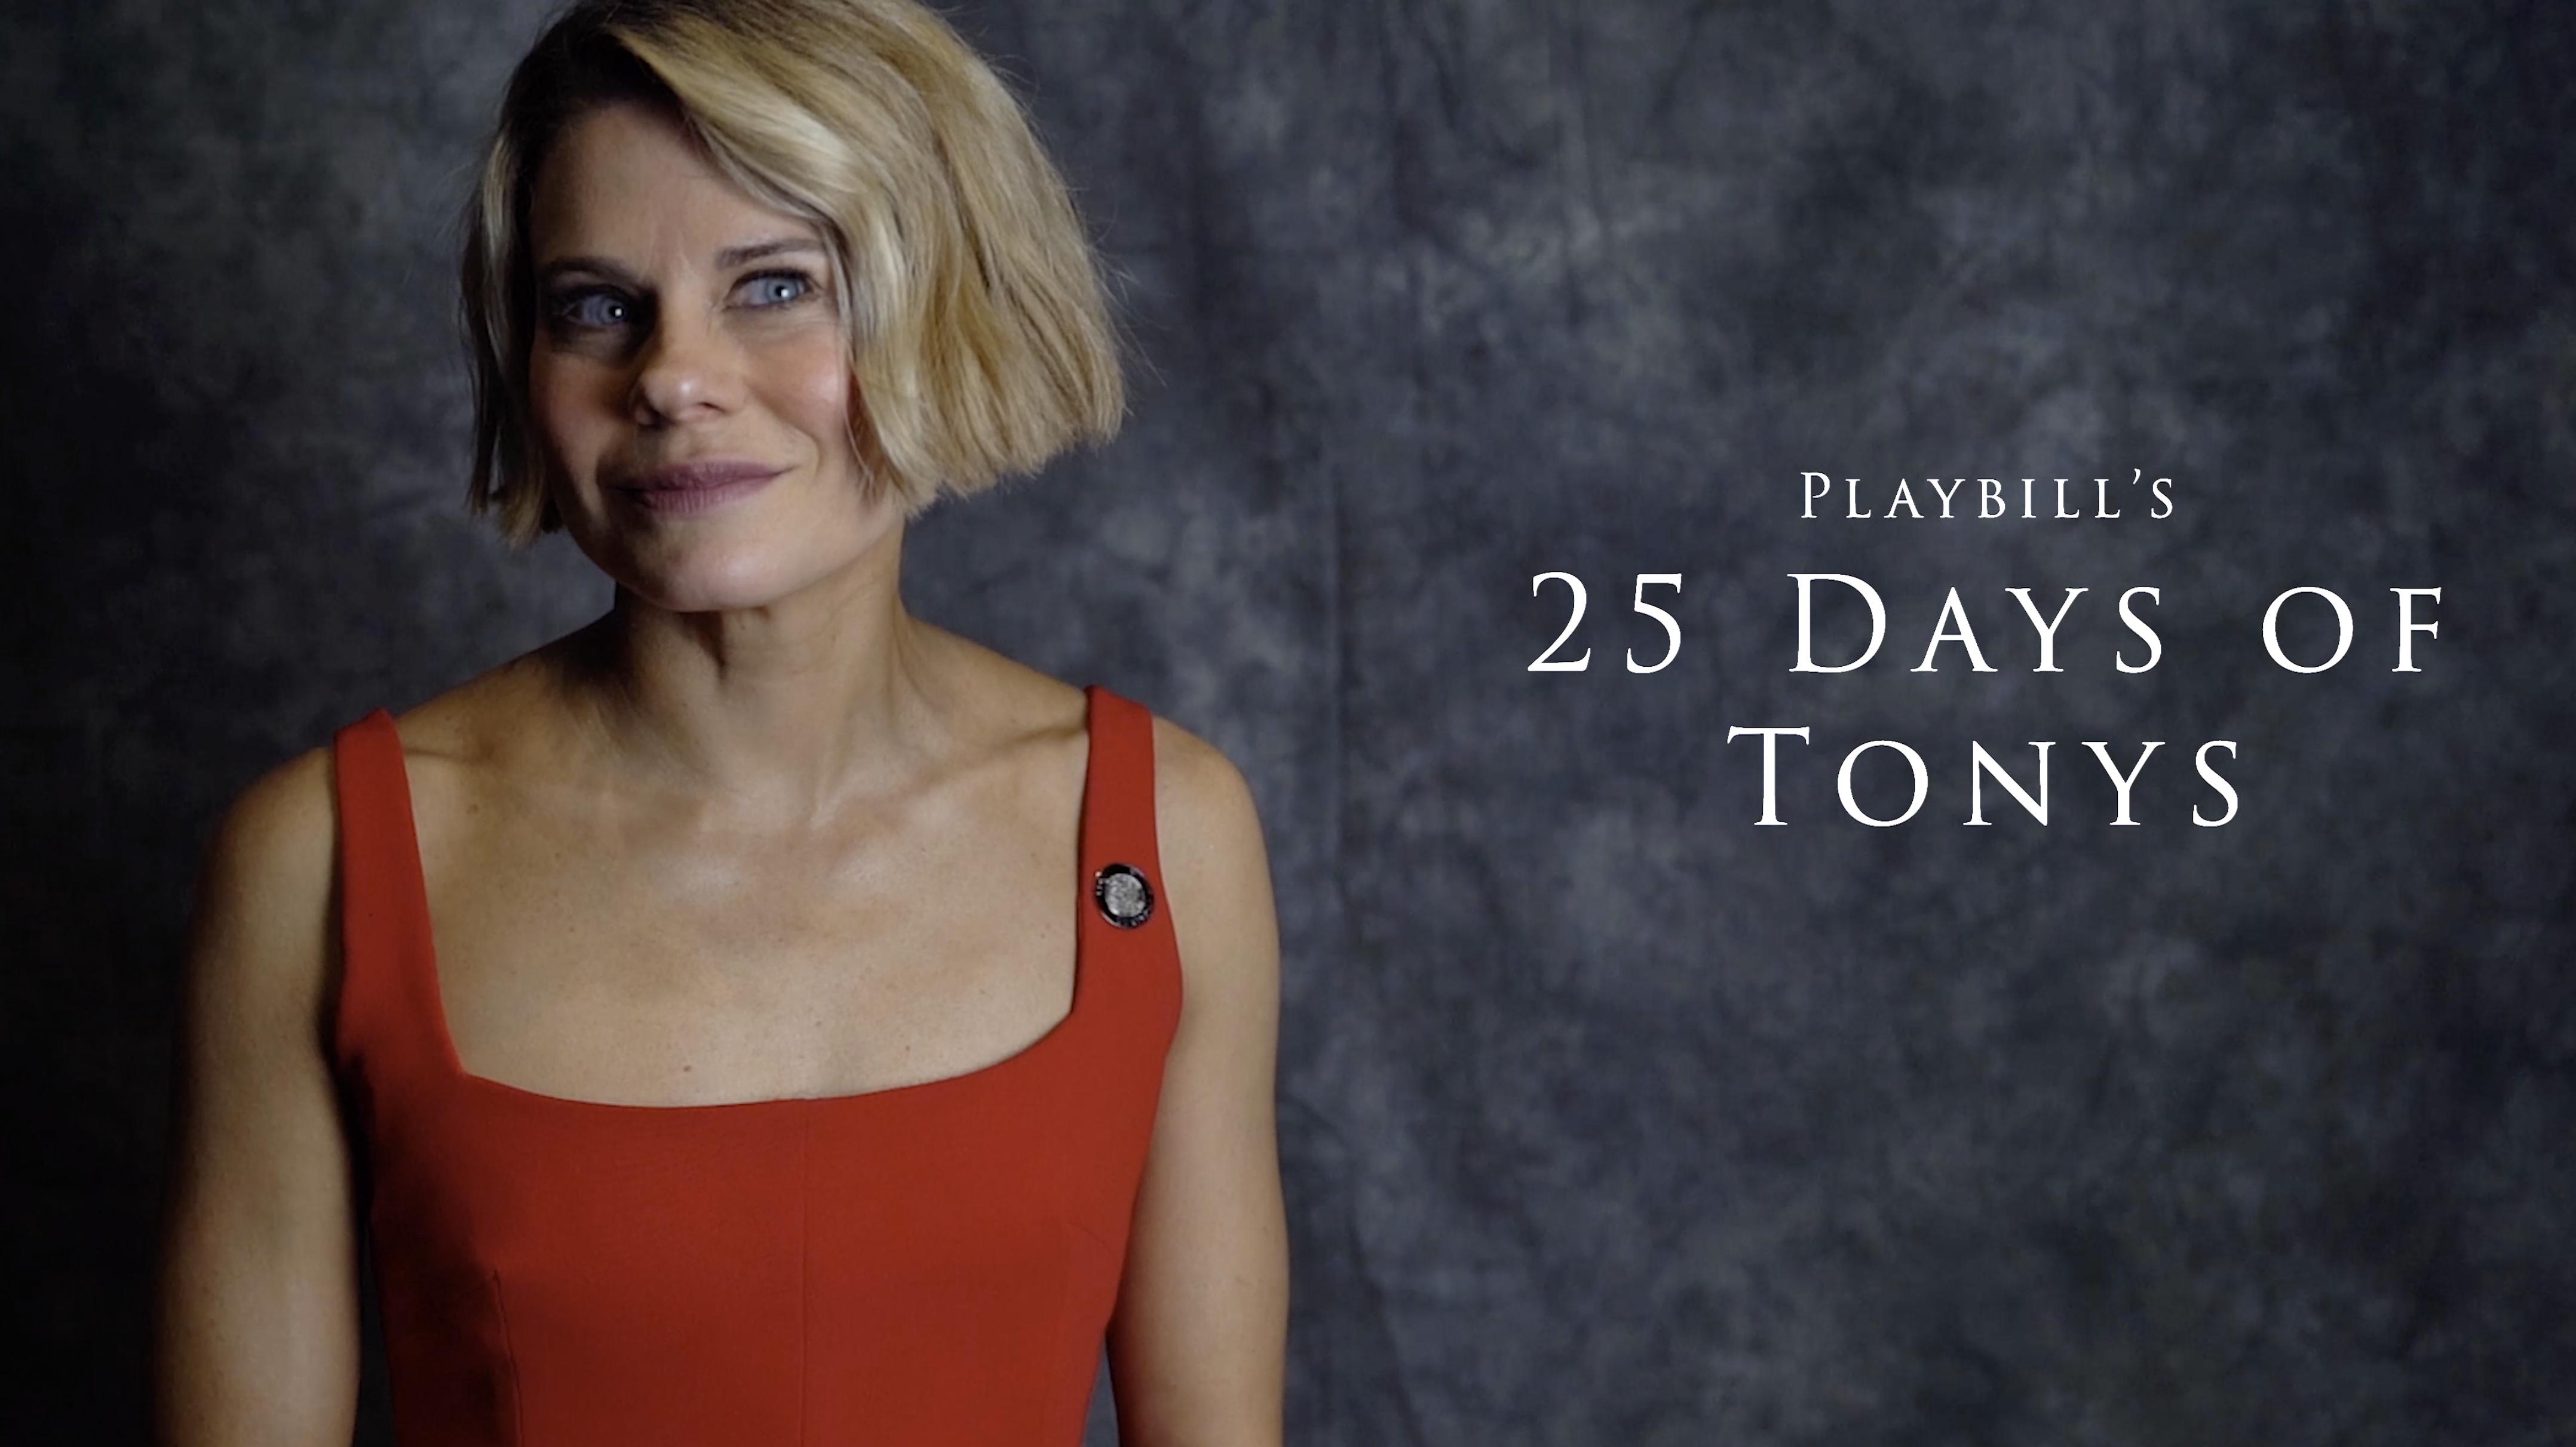 25 Days of Tonys: To Kill a Mockingbird's Celia Keenan-Bolger